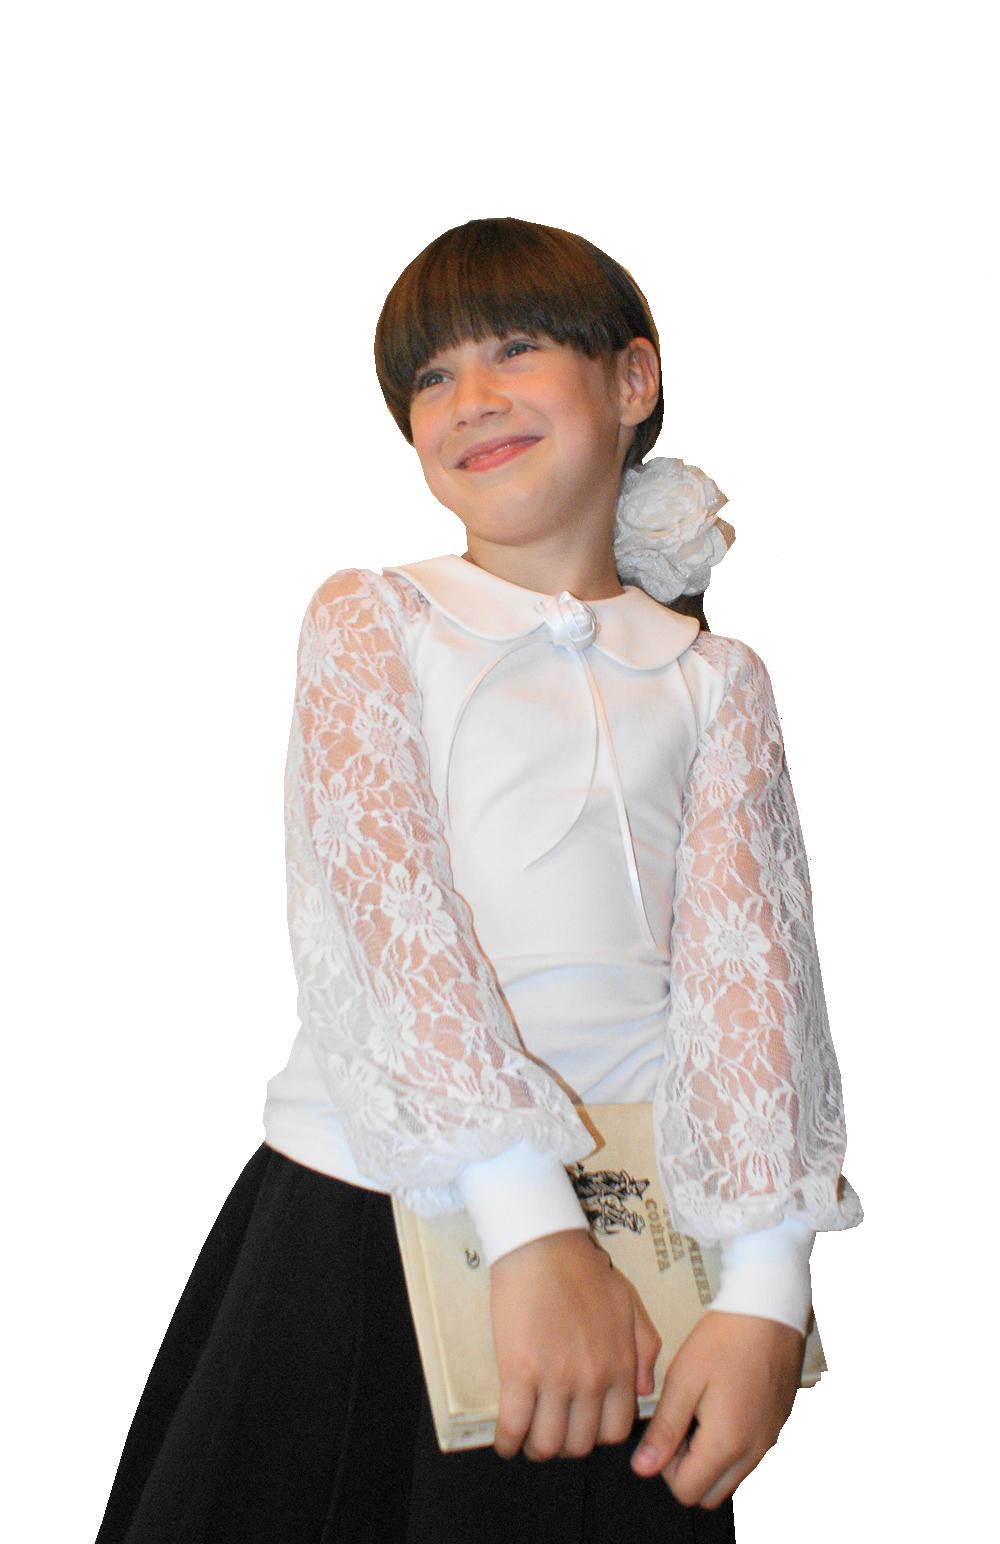 Купить Нарядную Белую Блузку Для Девочки В Школу